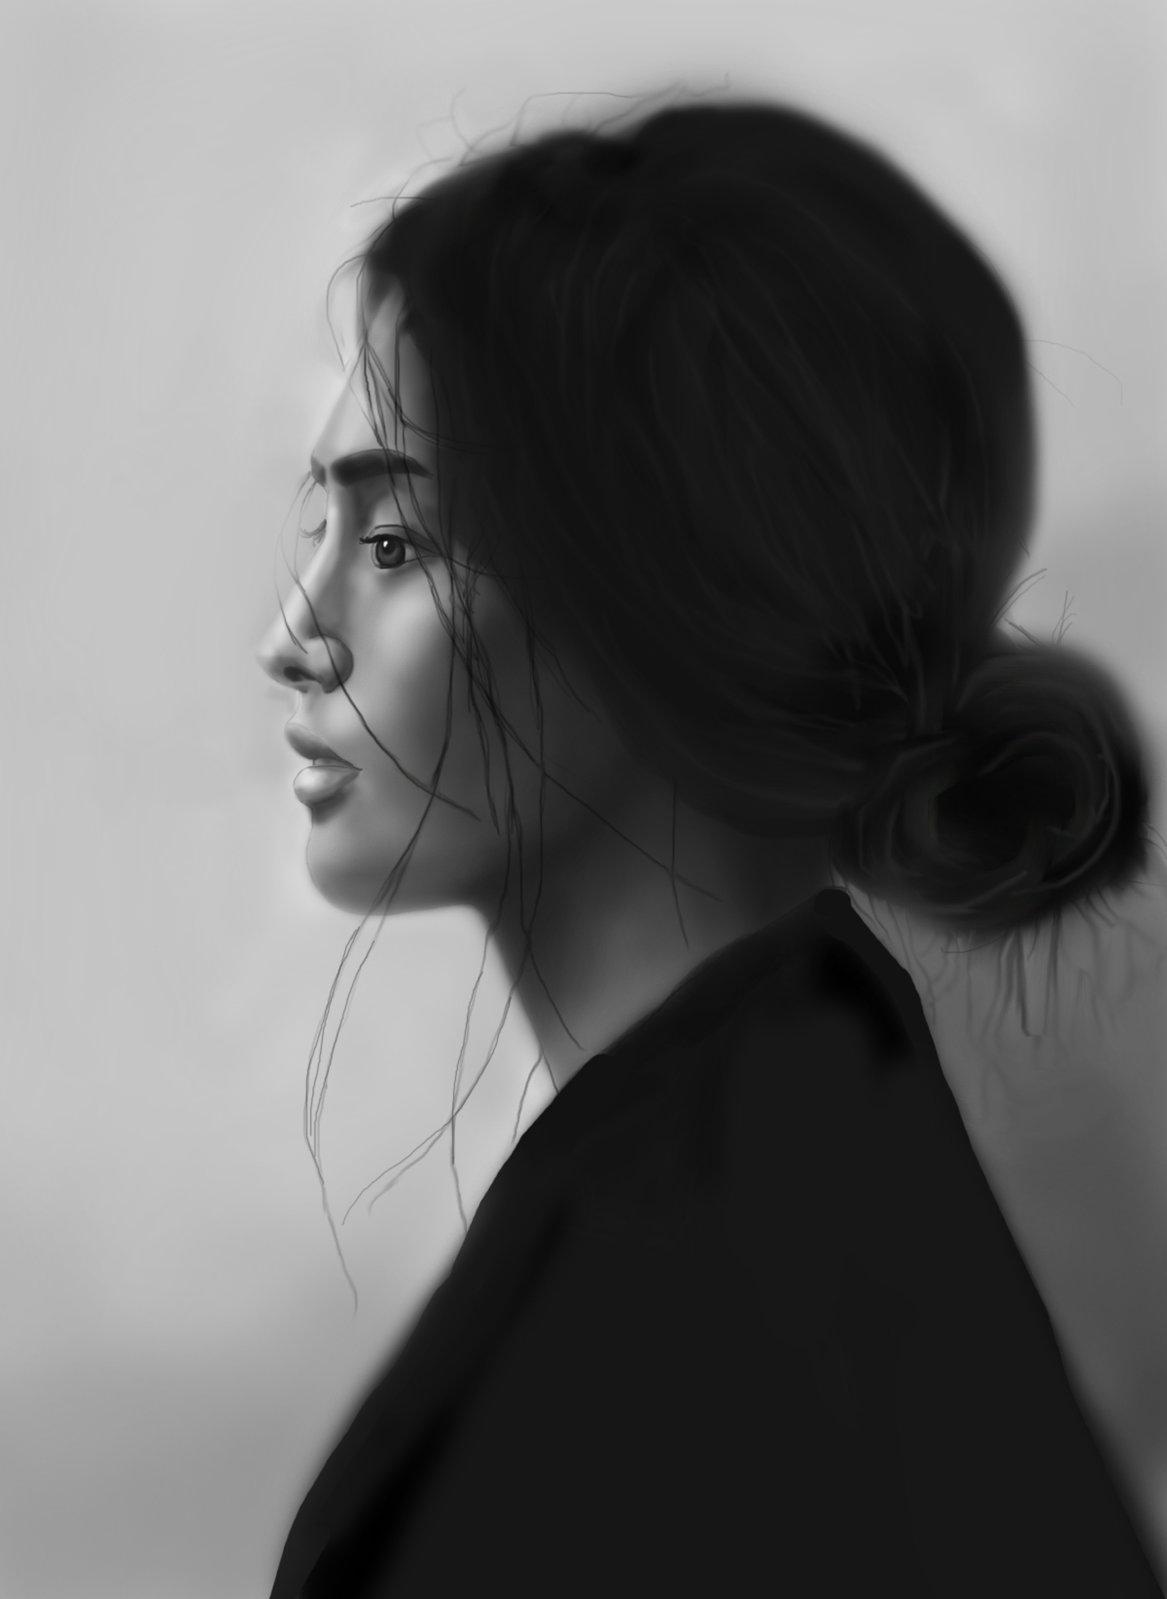 портрет4-3.jpg